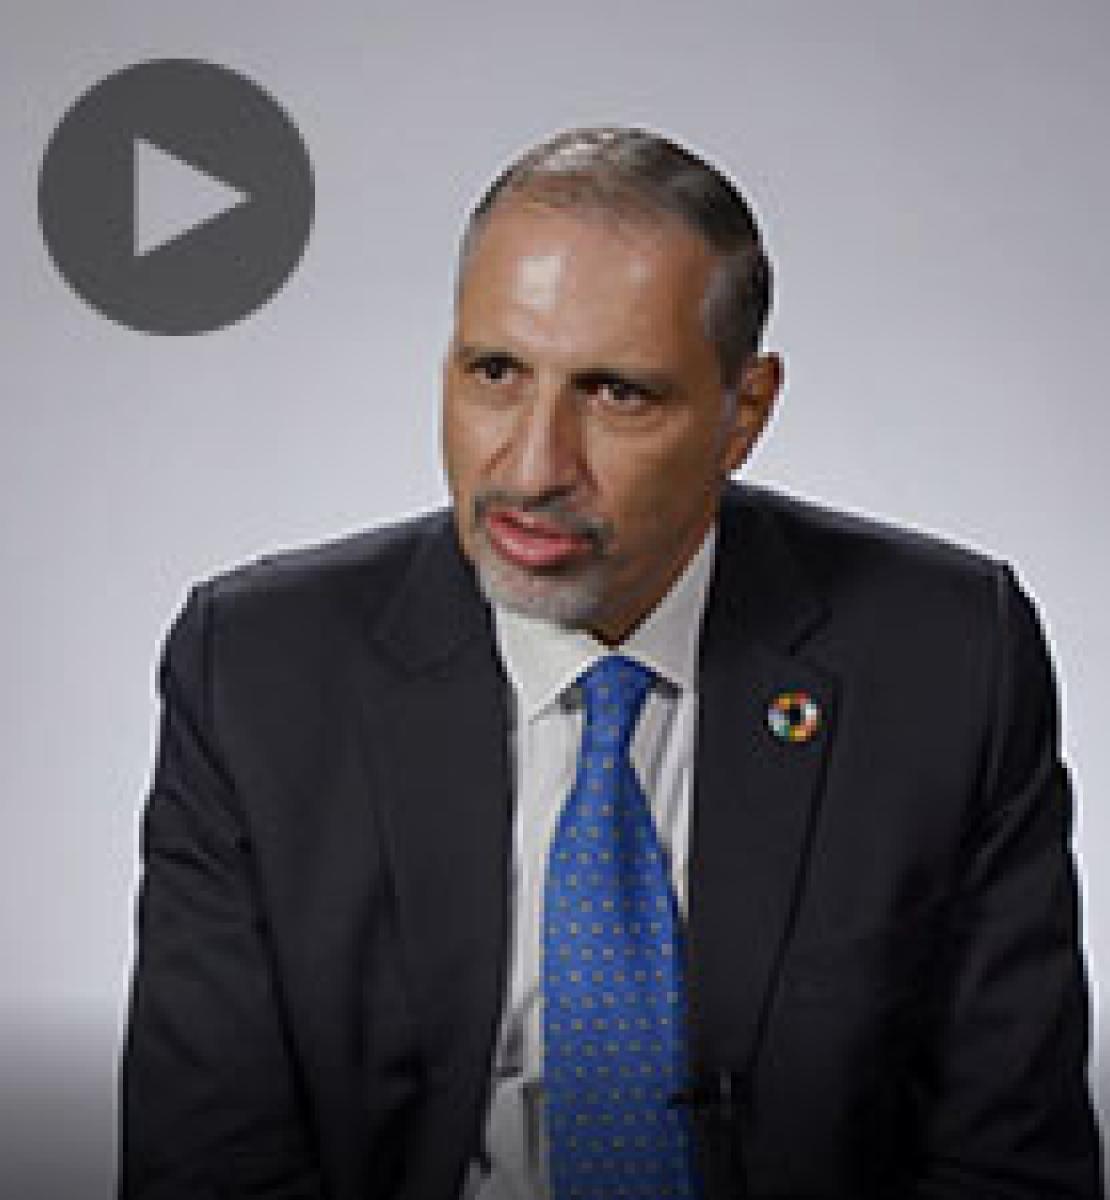 Screenshot from video message shows Resident Coordinator, Amin El Sharkawi